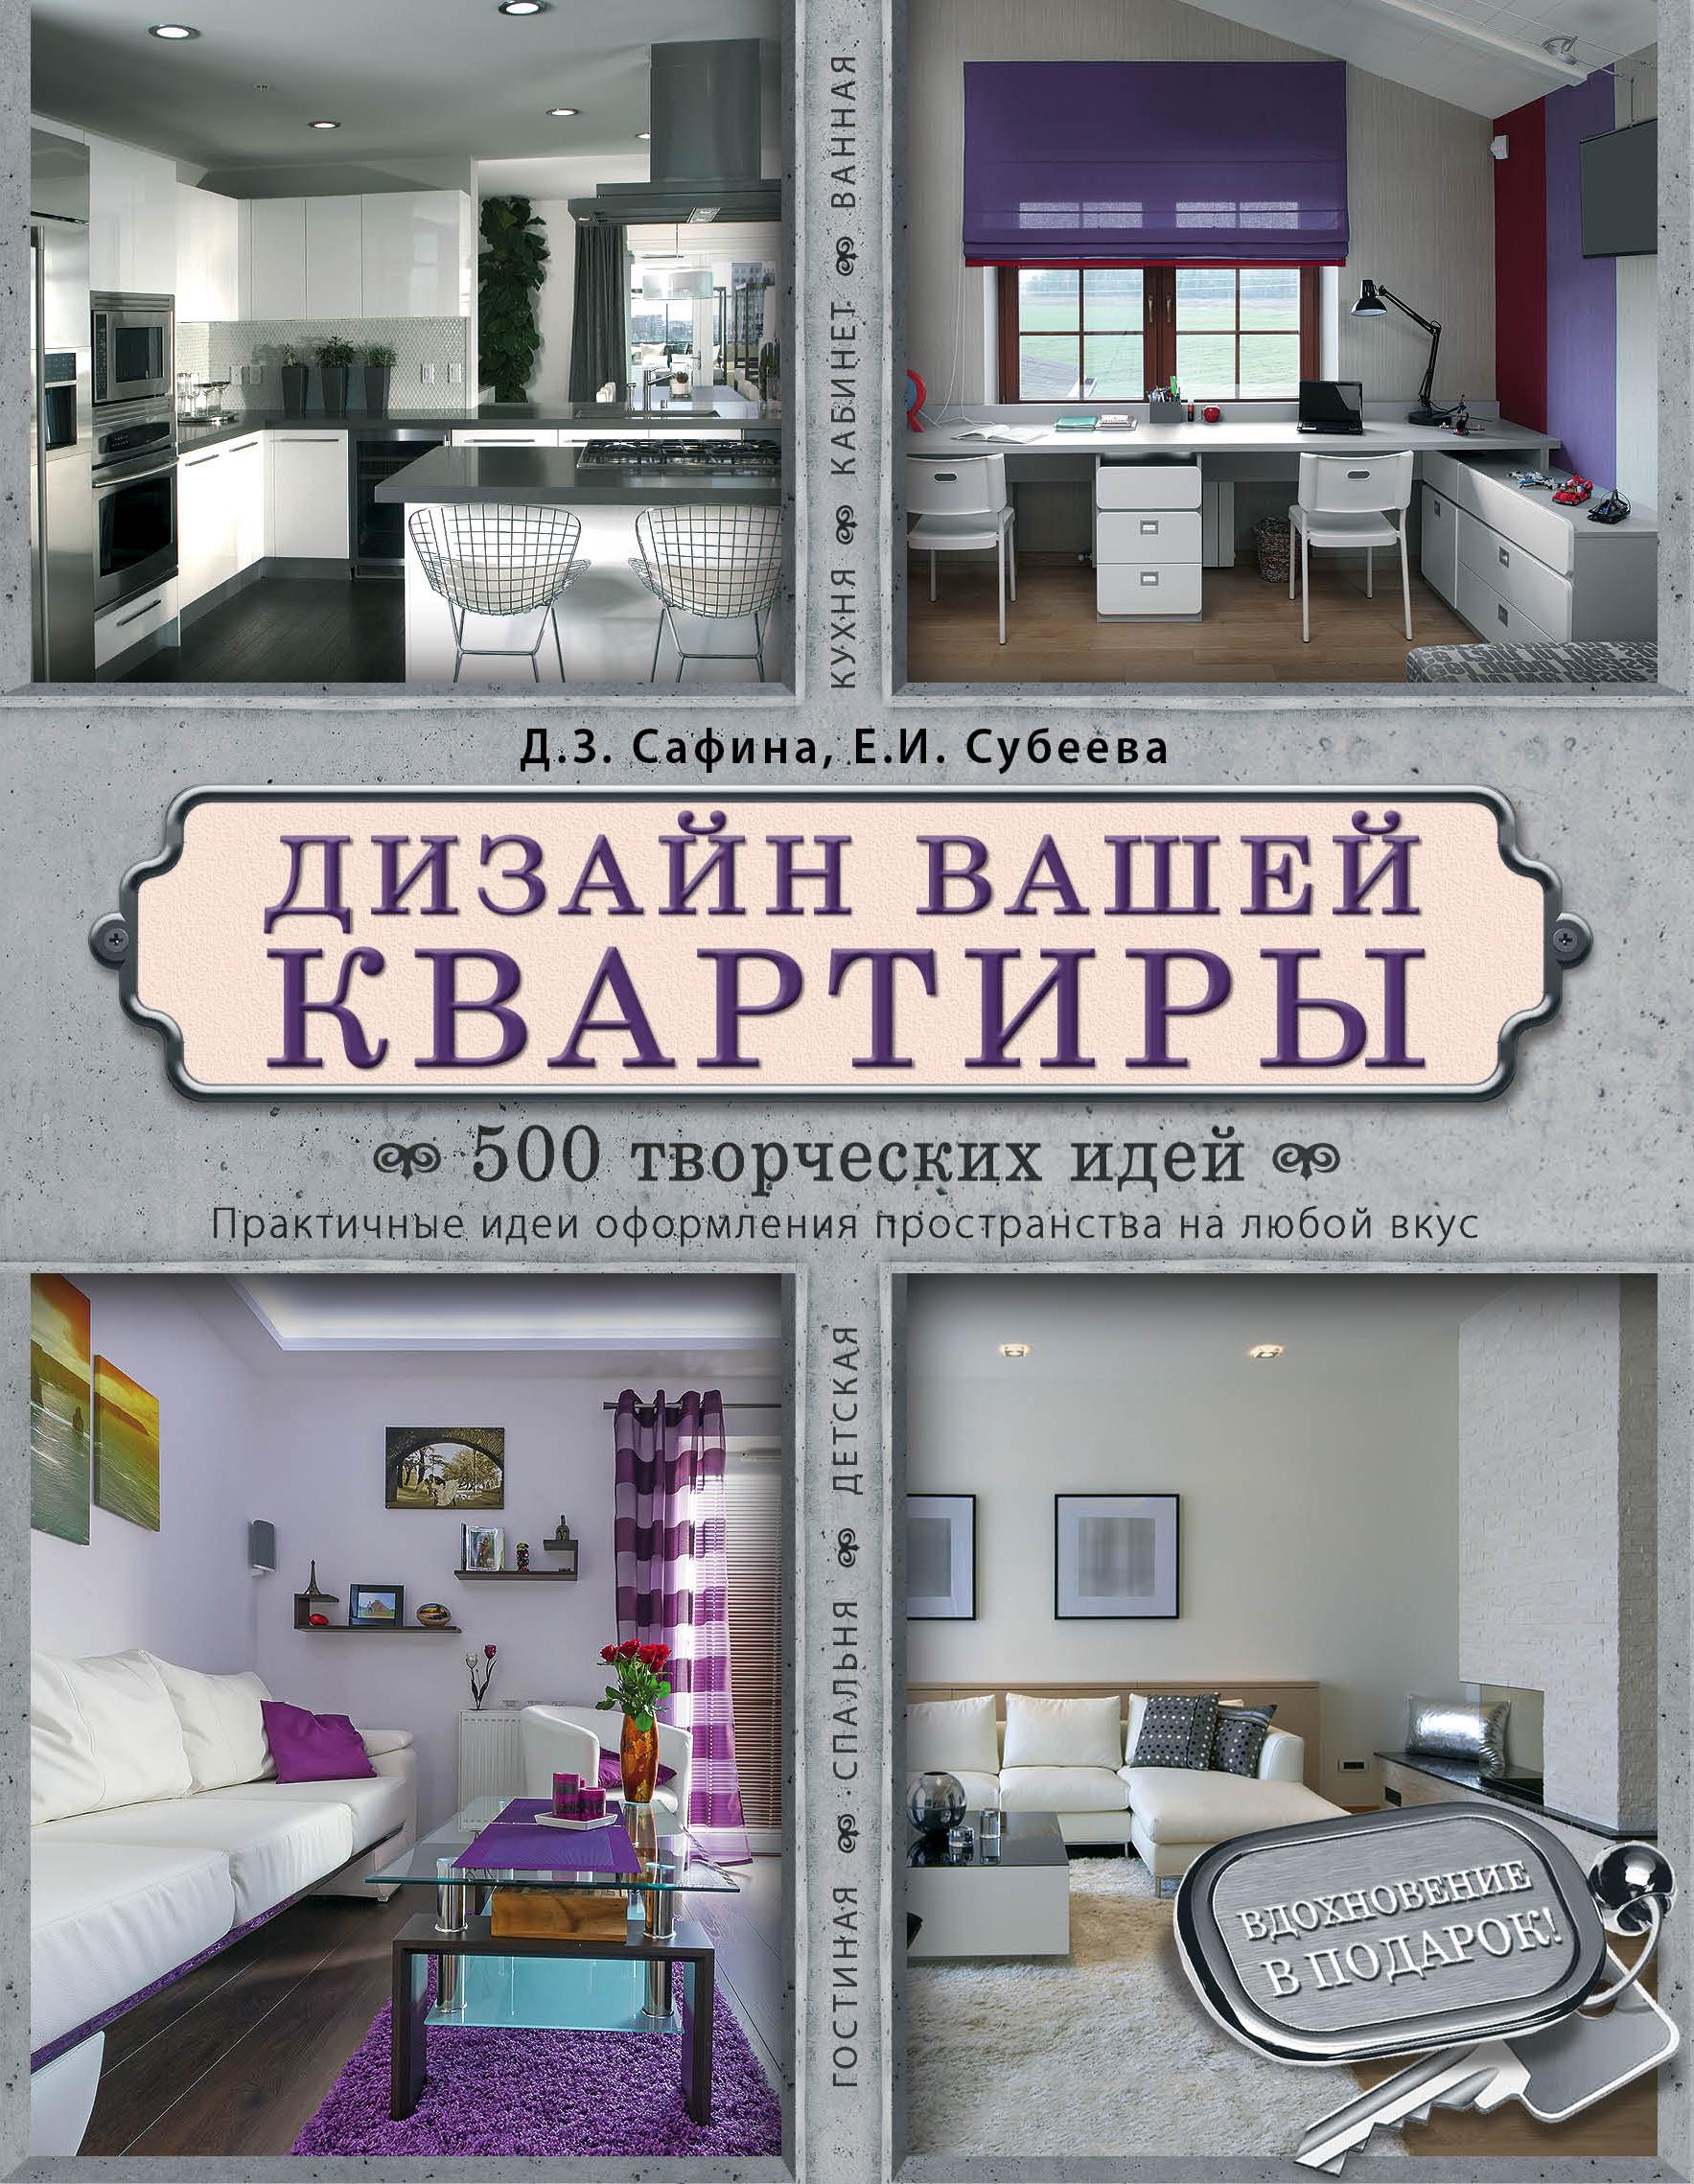 Дизайн вашей квартиры. 500 творческих идей ( Сафина Д.З., Субеева Е.И.  )